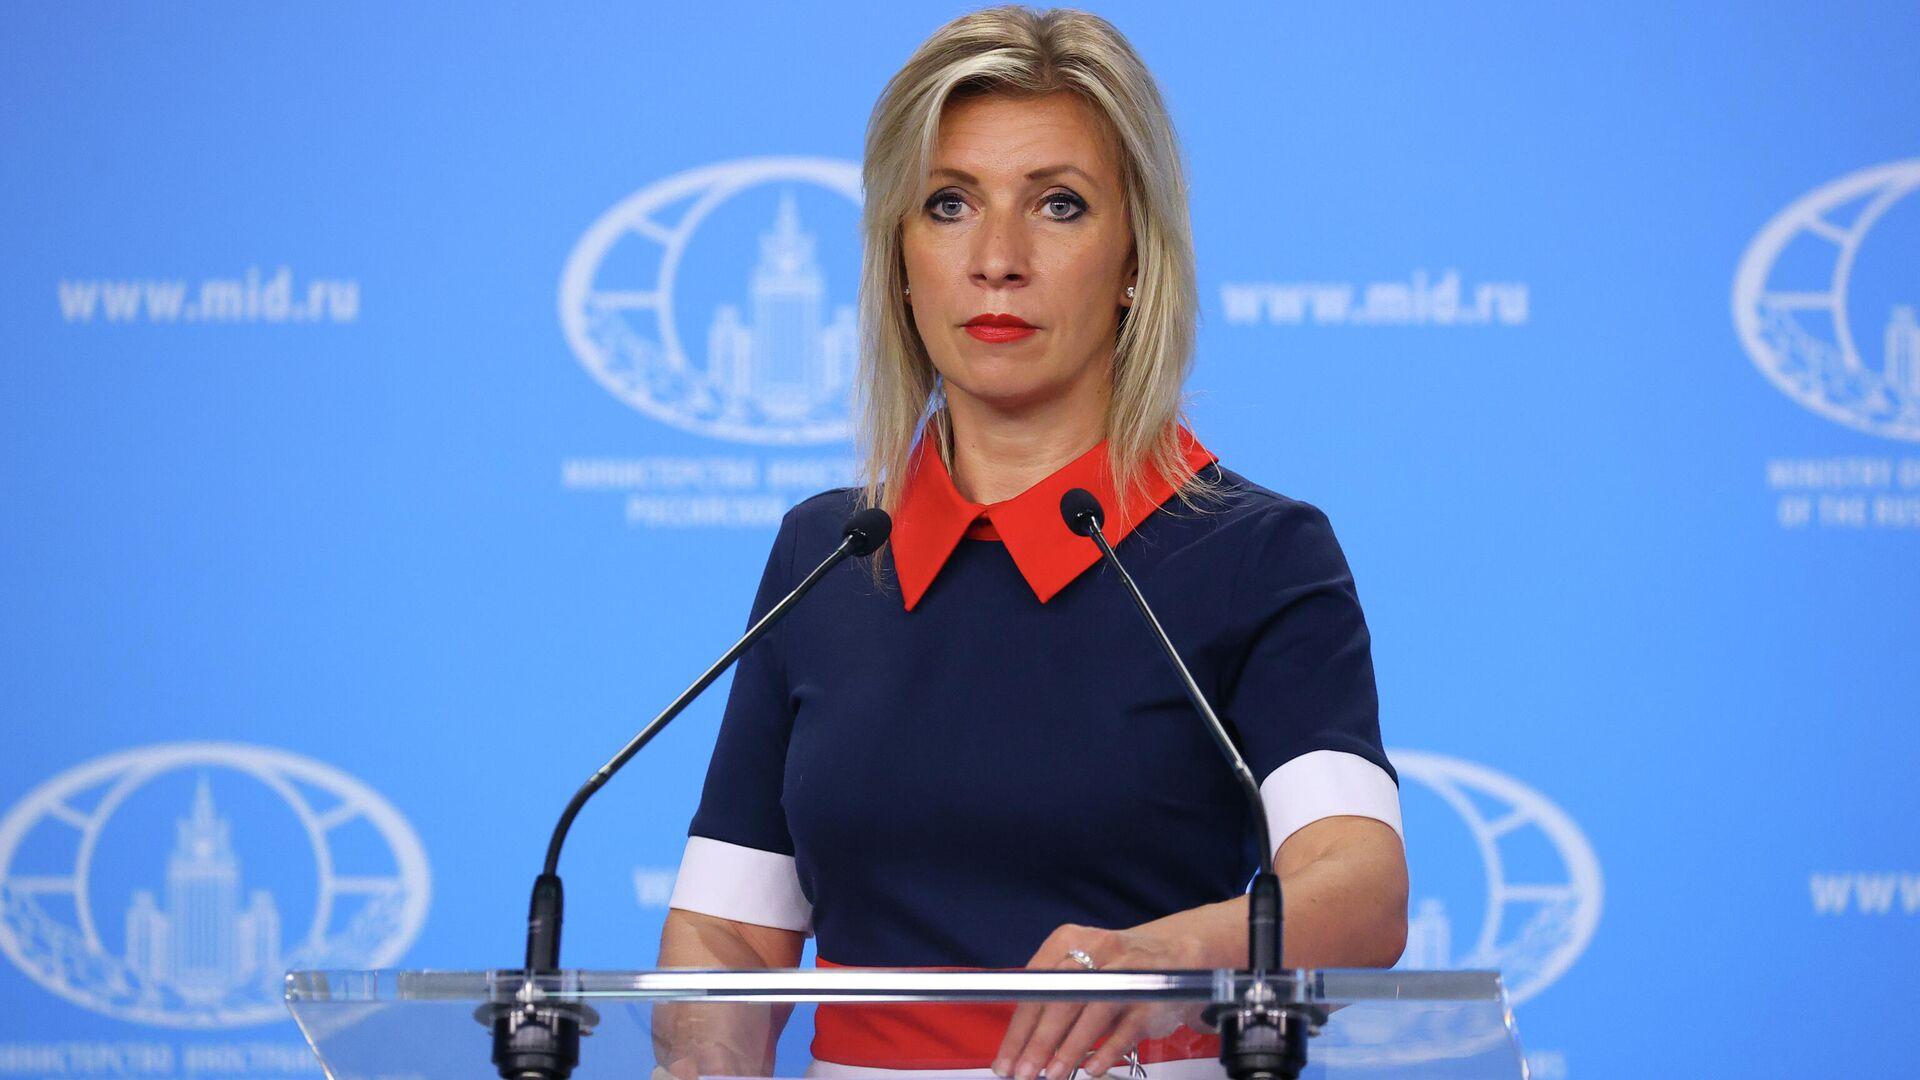 La portavoz del Ministerio de Asuntos Exteriores ruso, María Zajárova - Sputnik Mundo, 1920, 16.09.2021